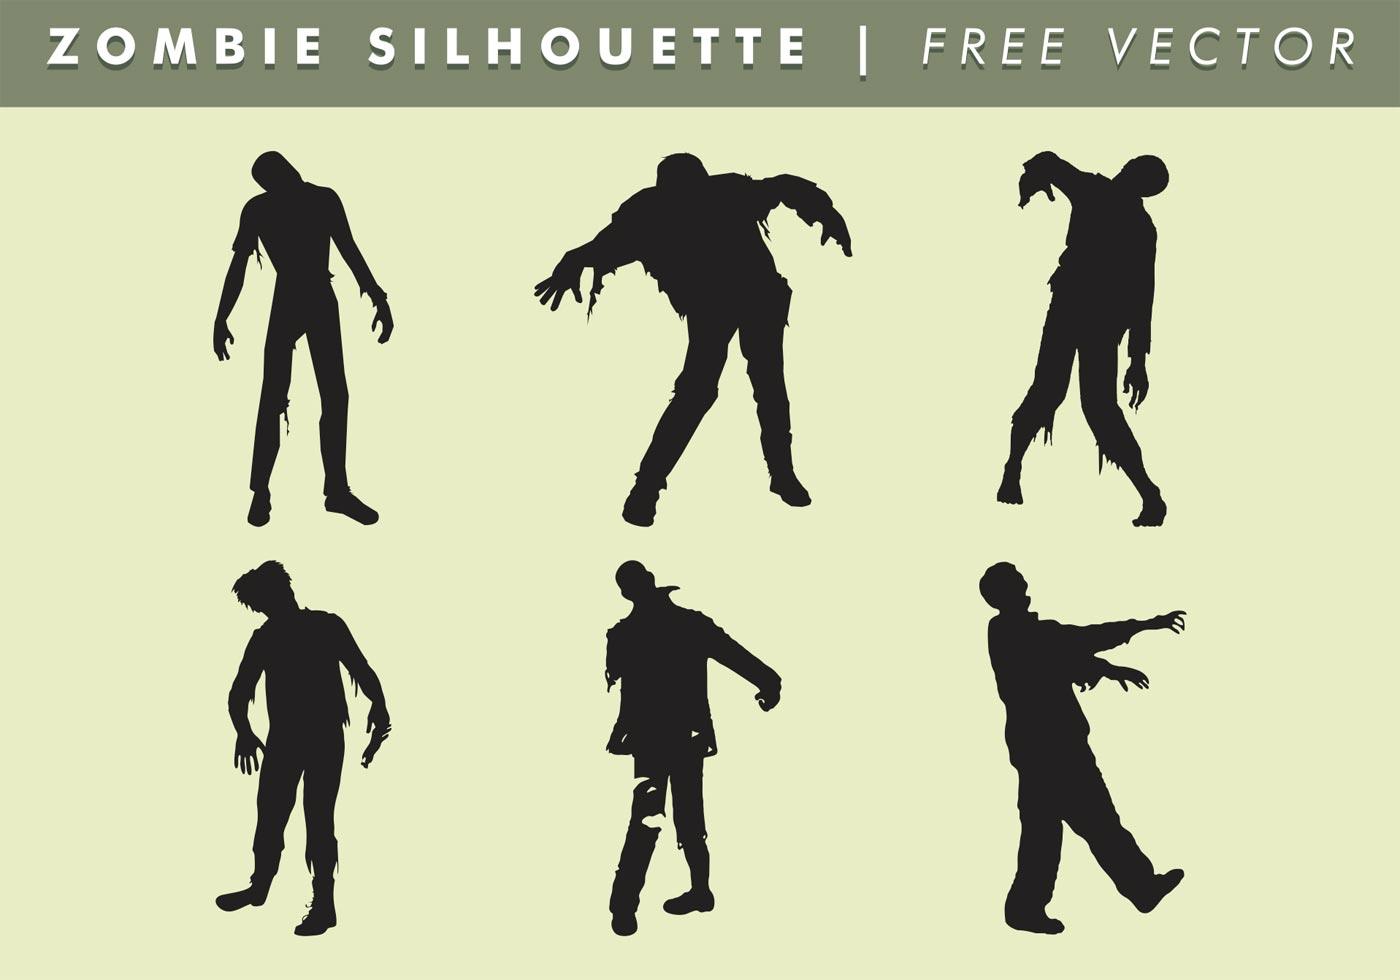 Zombie Silhouette Free Vector Art.